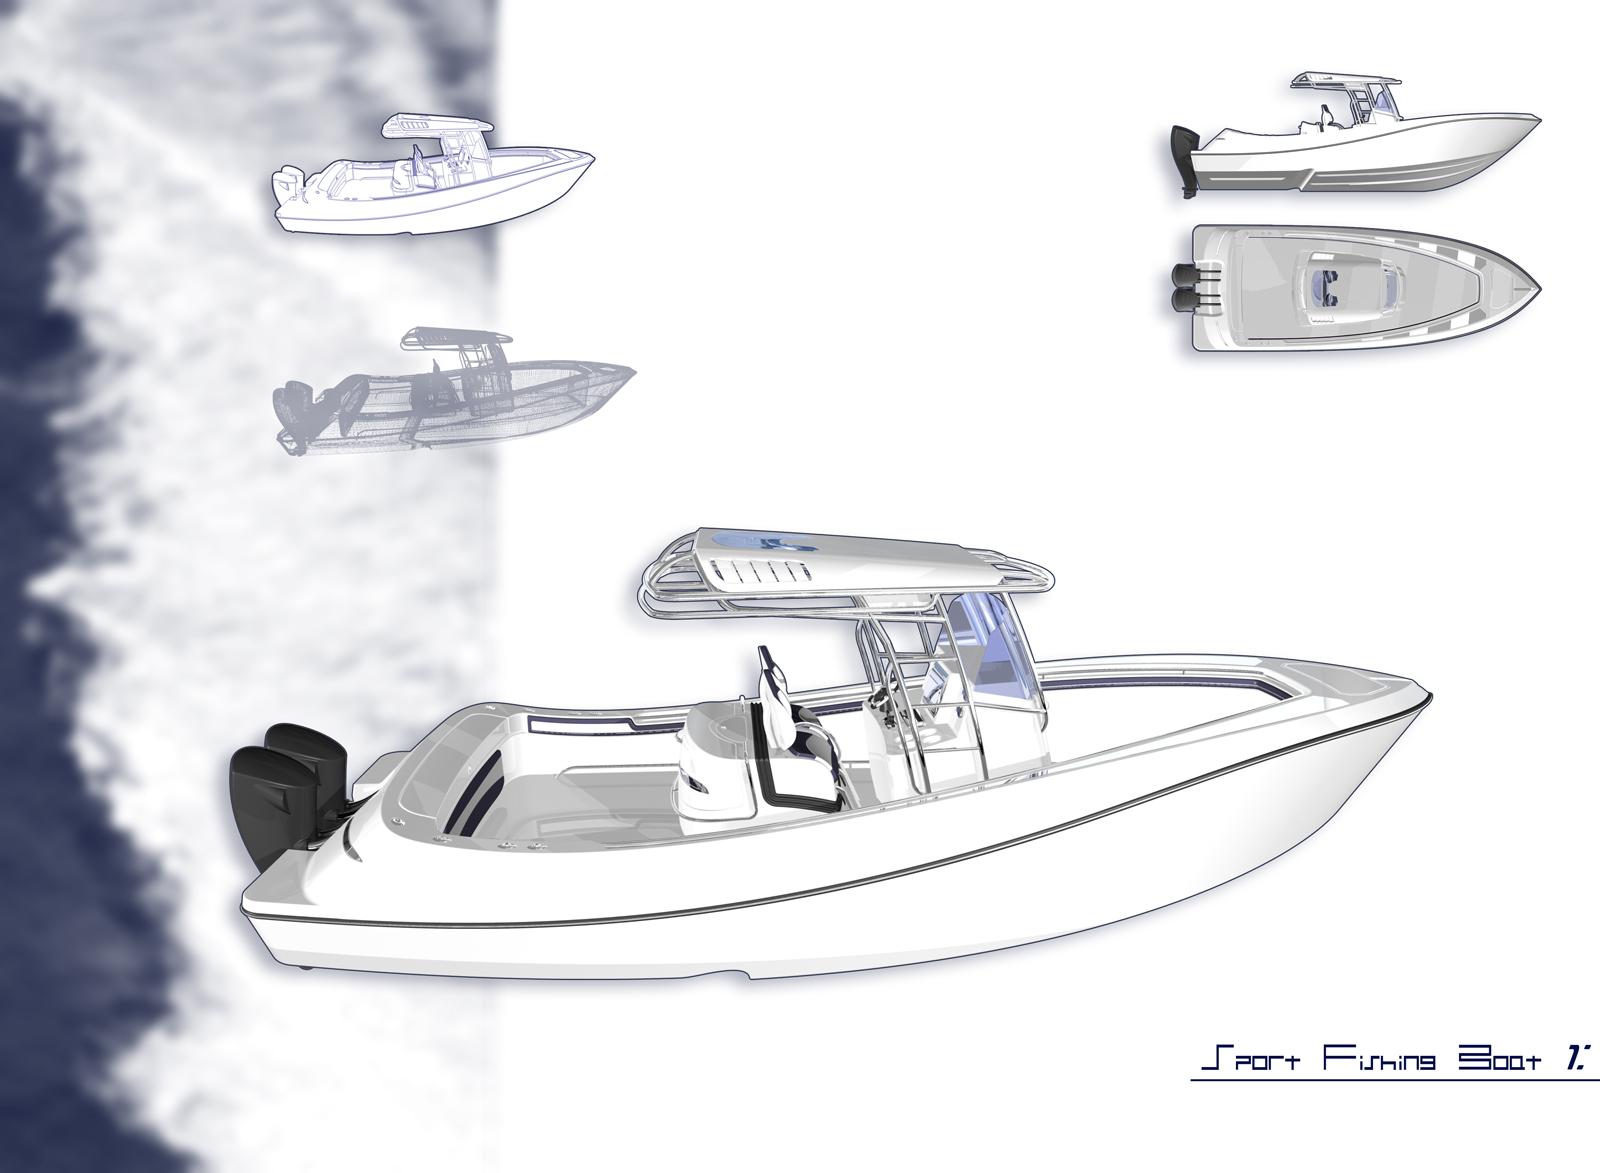 Center Console Boat Design Software